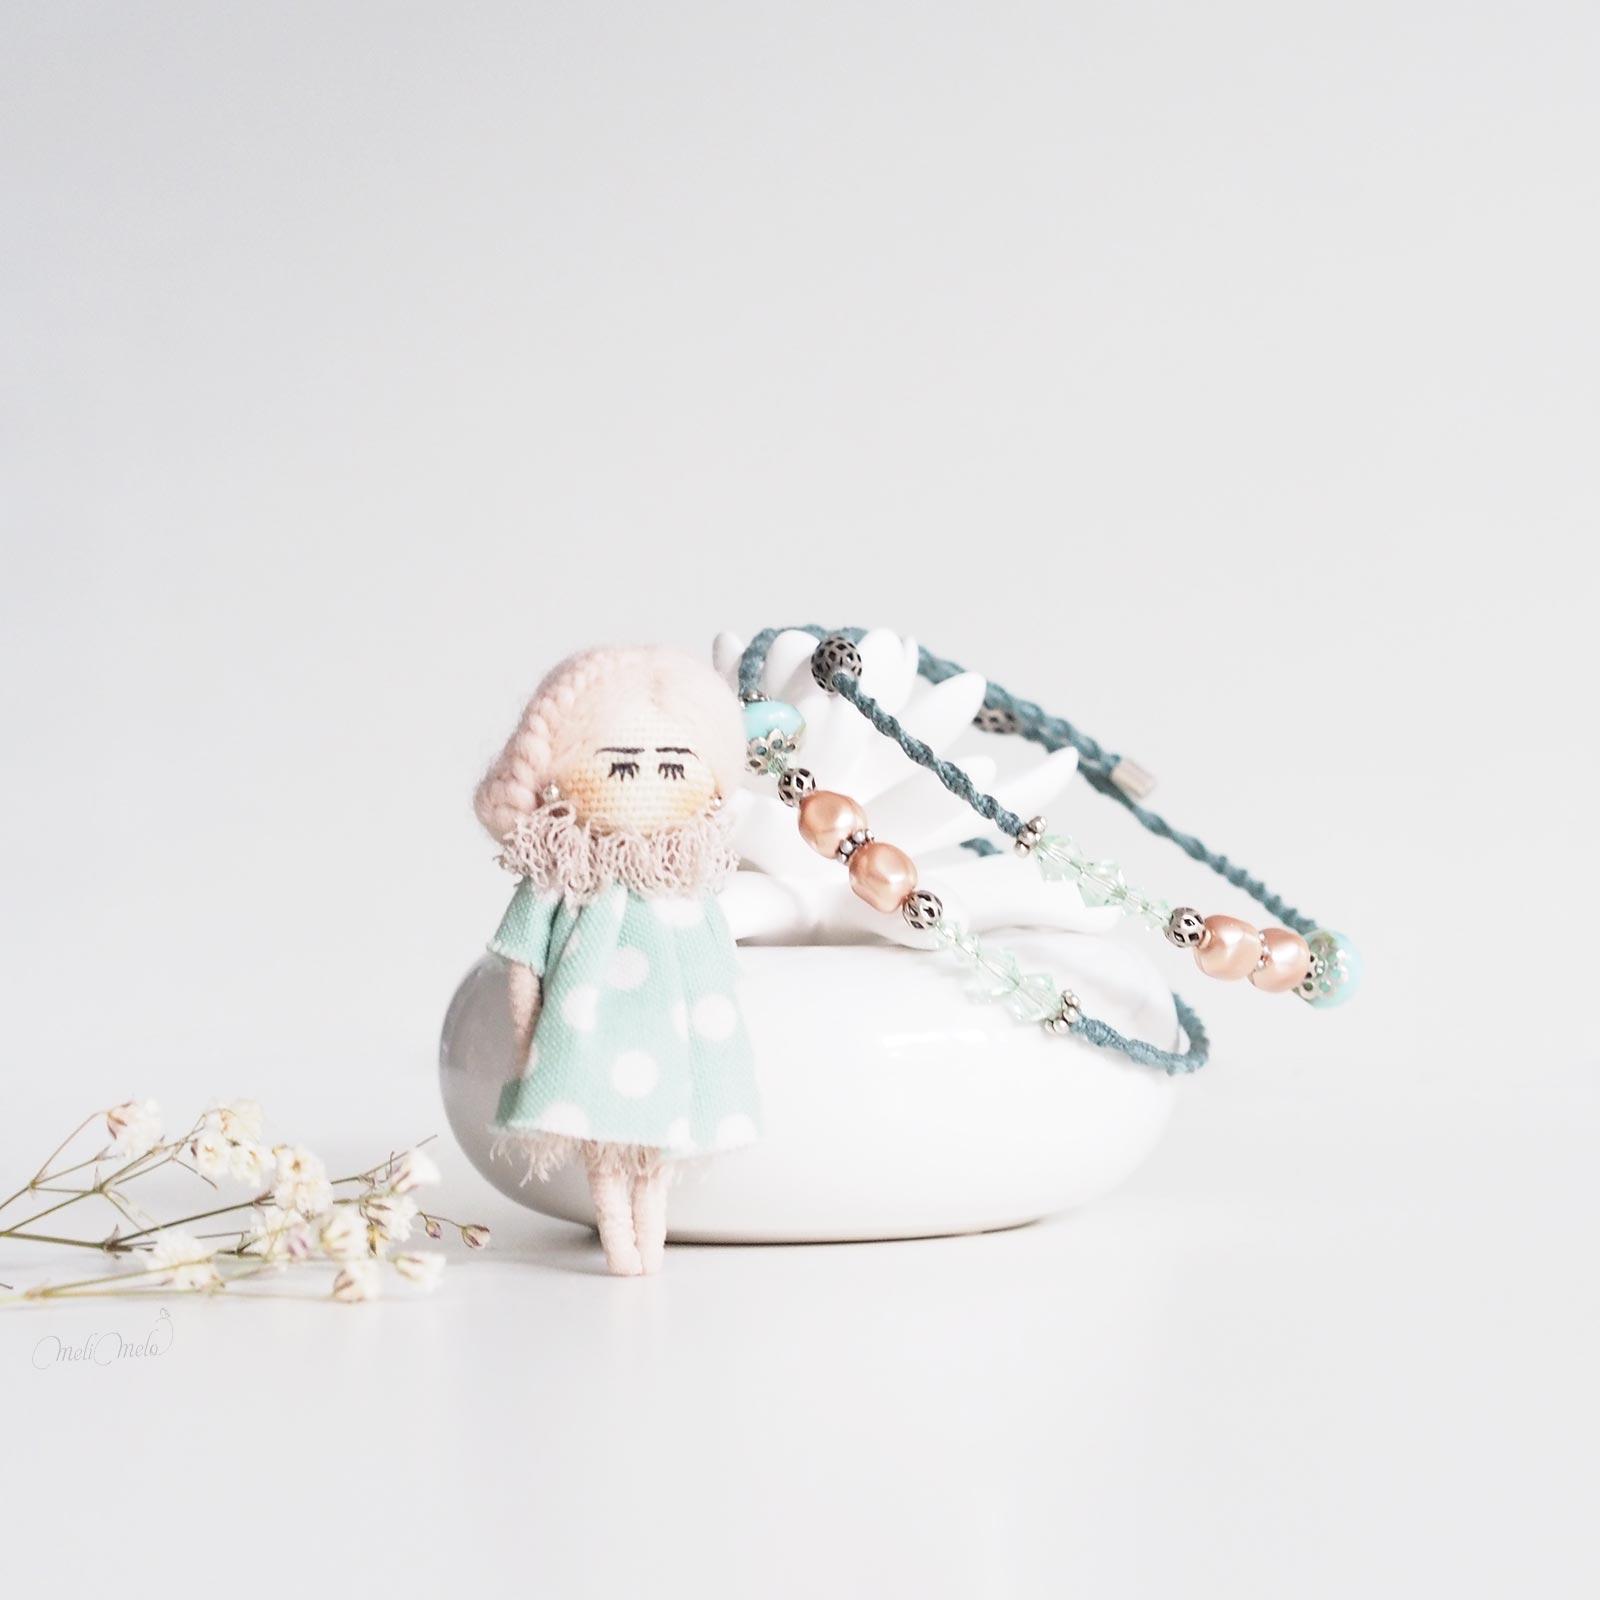 duo rose chrysolite bracelet Swarovski nacré broche poupée laboutiquedemelimelo